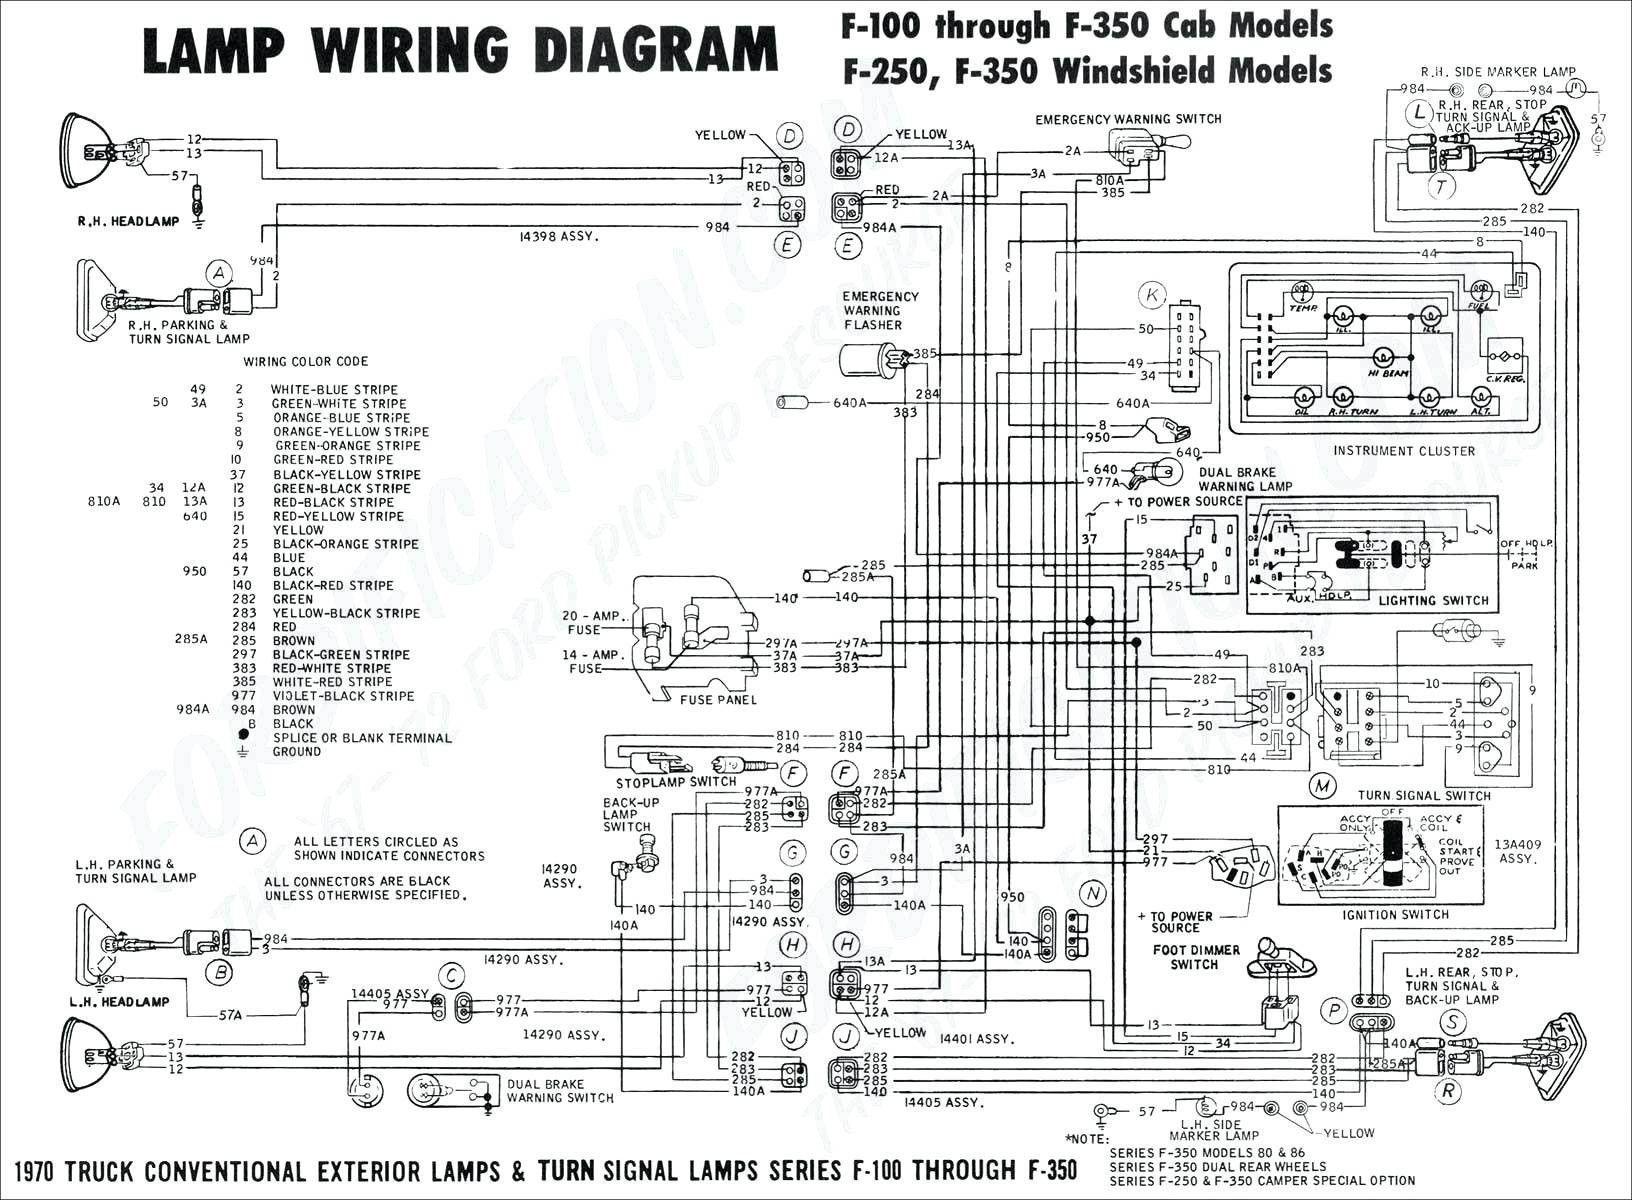 1996 Gas Ezgo Wire Diagram In 2020 Electrical Diagram Trailer Wiring Diagram Electrical Wiring Diagram